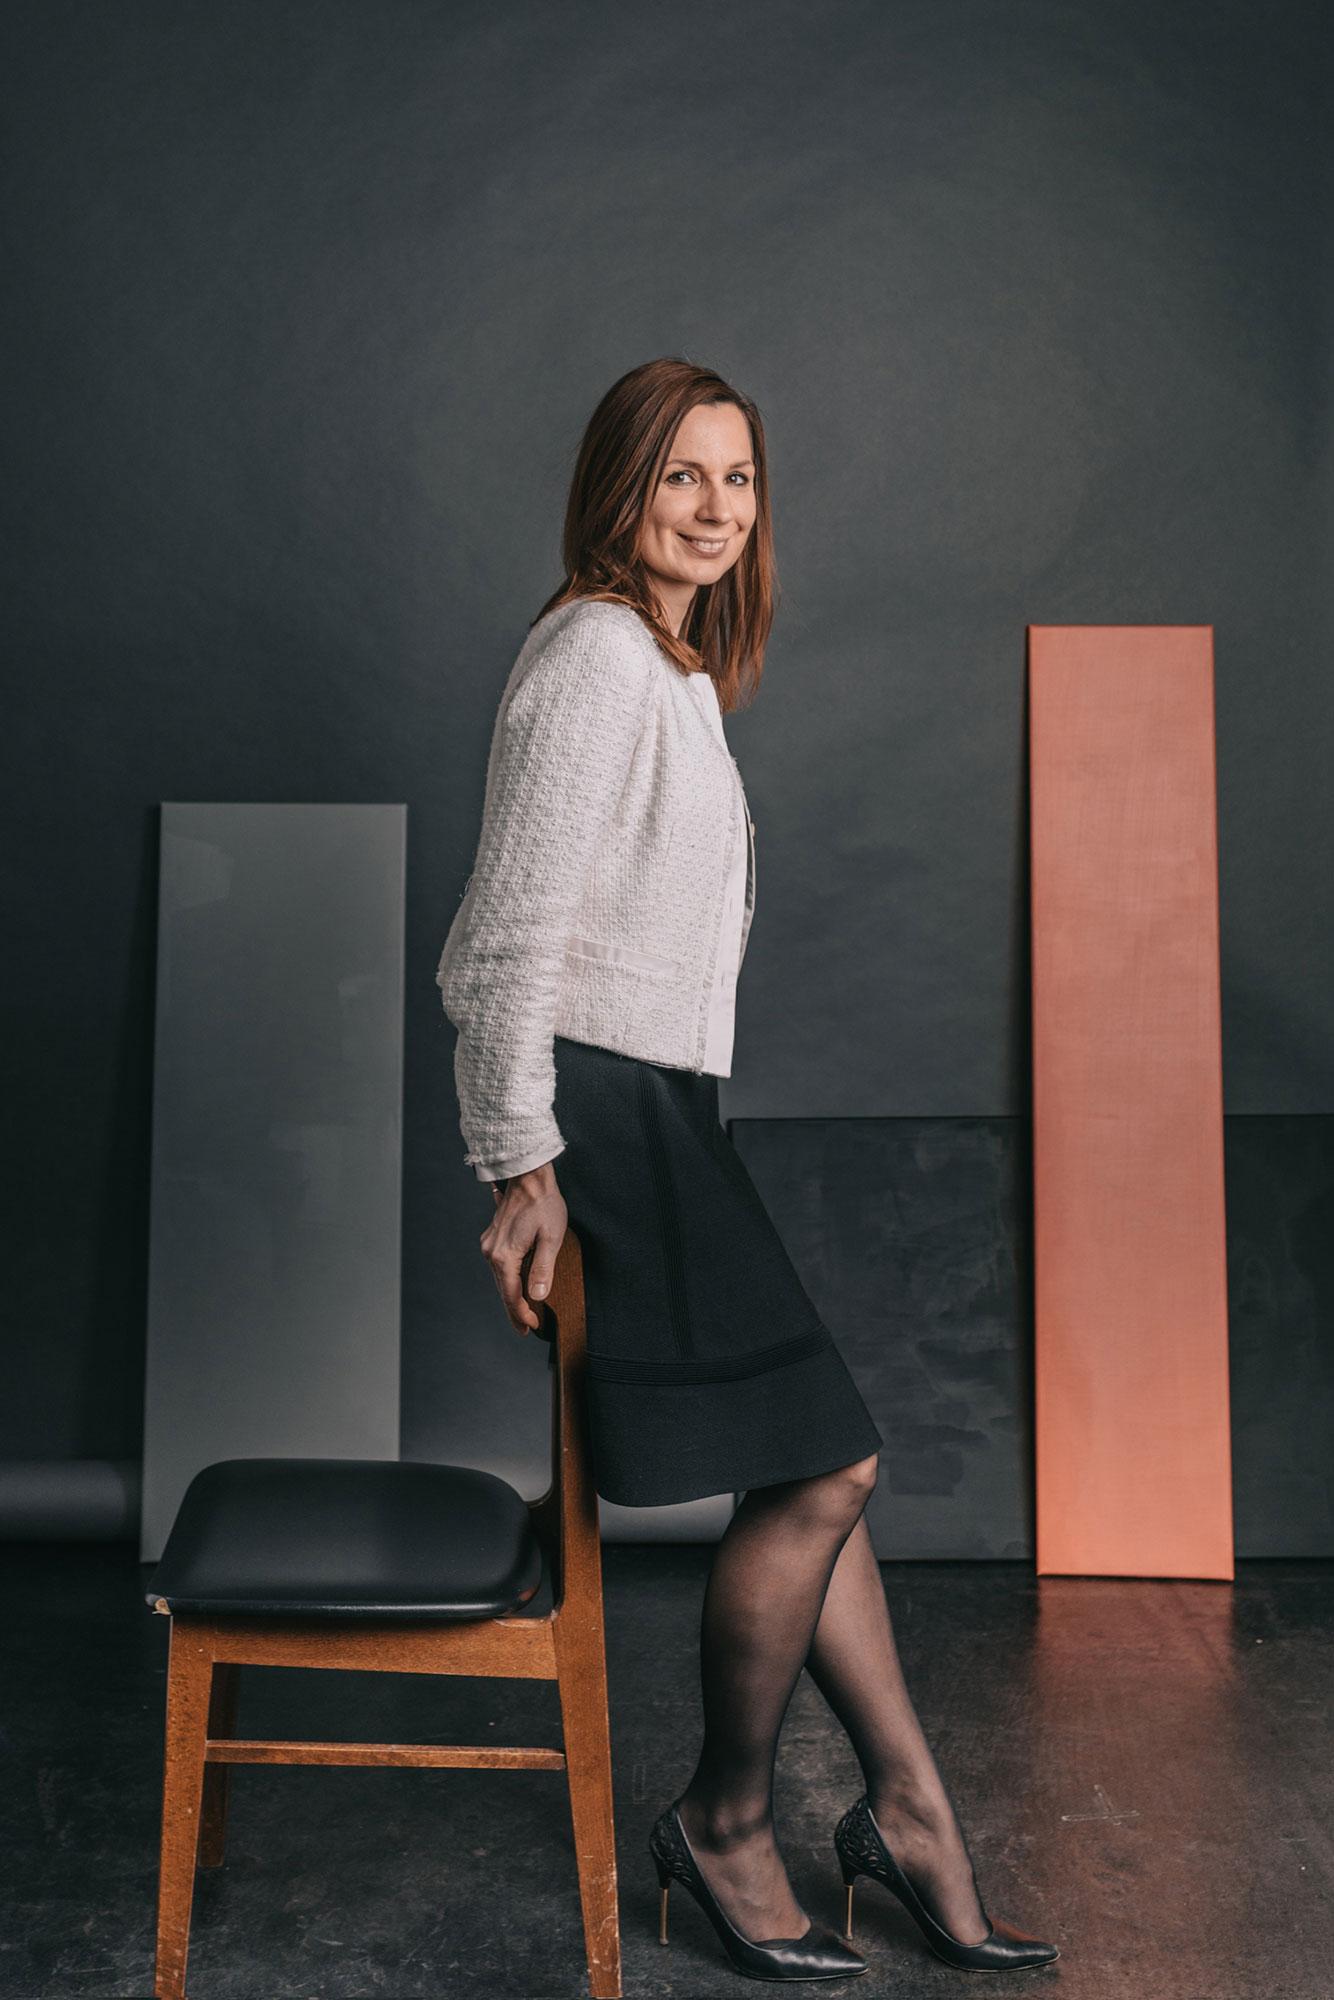 julia-arztmann